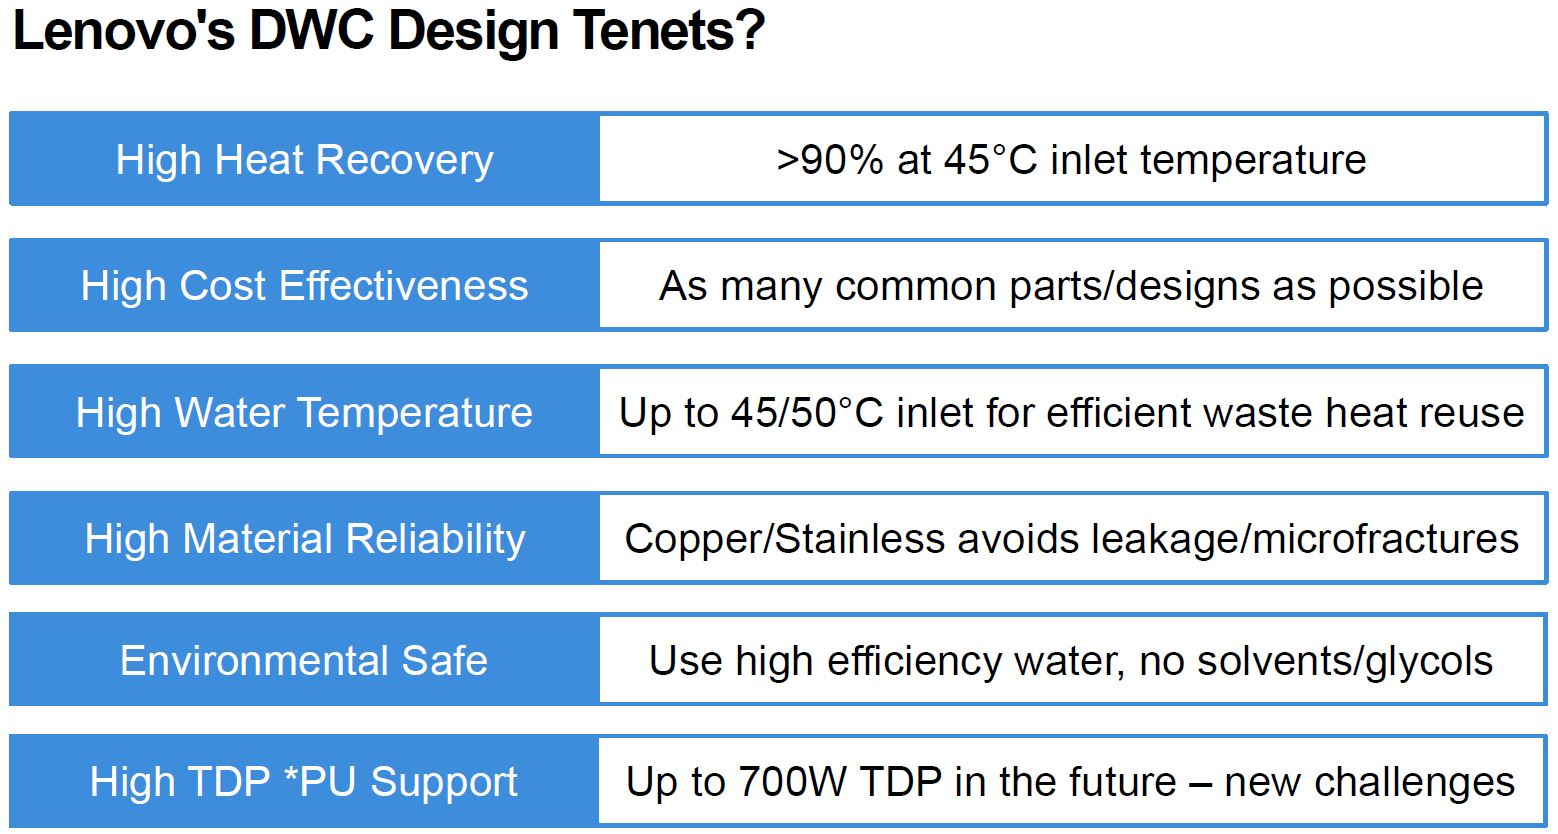 Lenovo DWC Design Denets Liquid Cooling Neptune Q3 2021